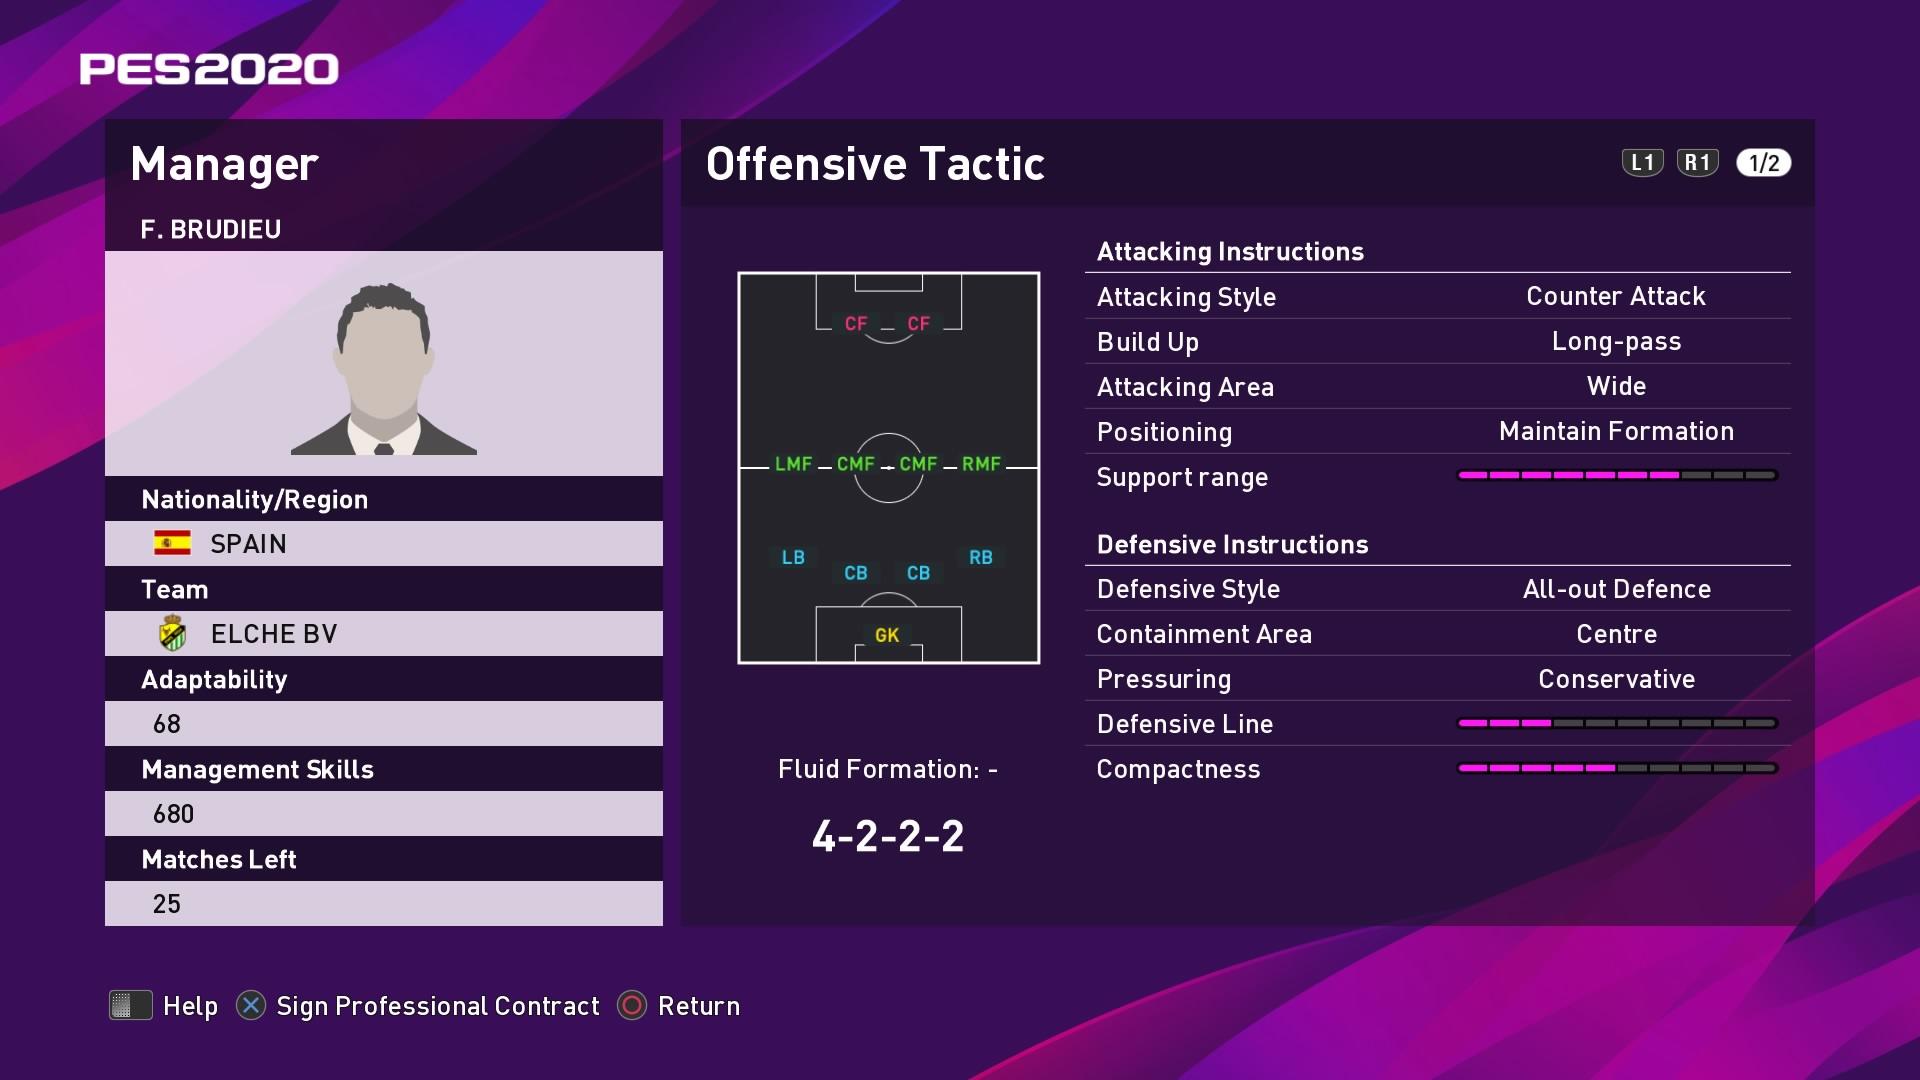 F. Brudieu (Pacheta) Offensive Tactic in PES 2020 myClub